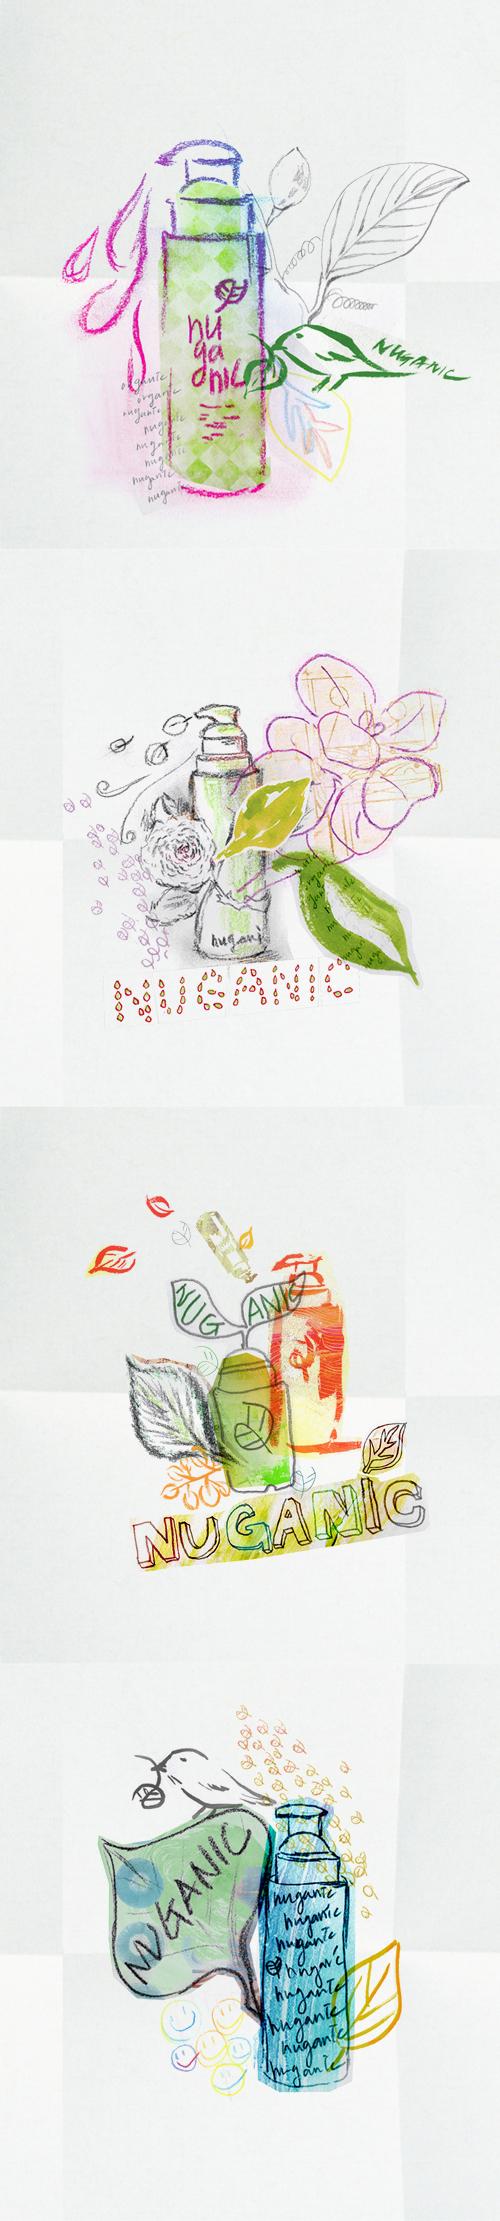 nuganic_bl_1